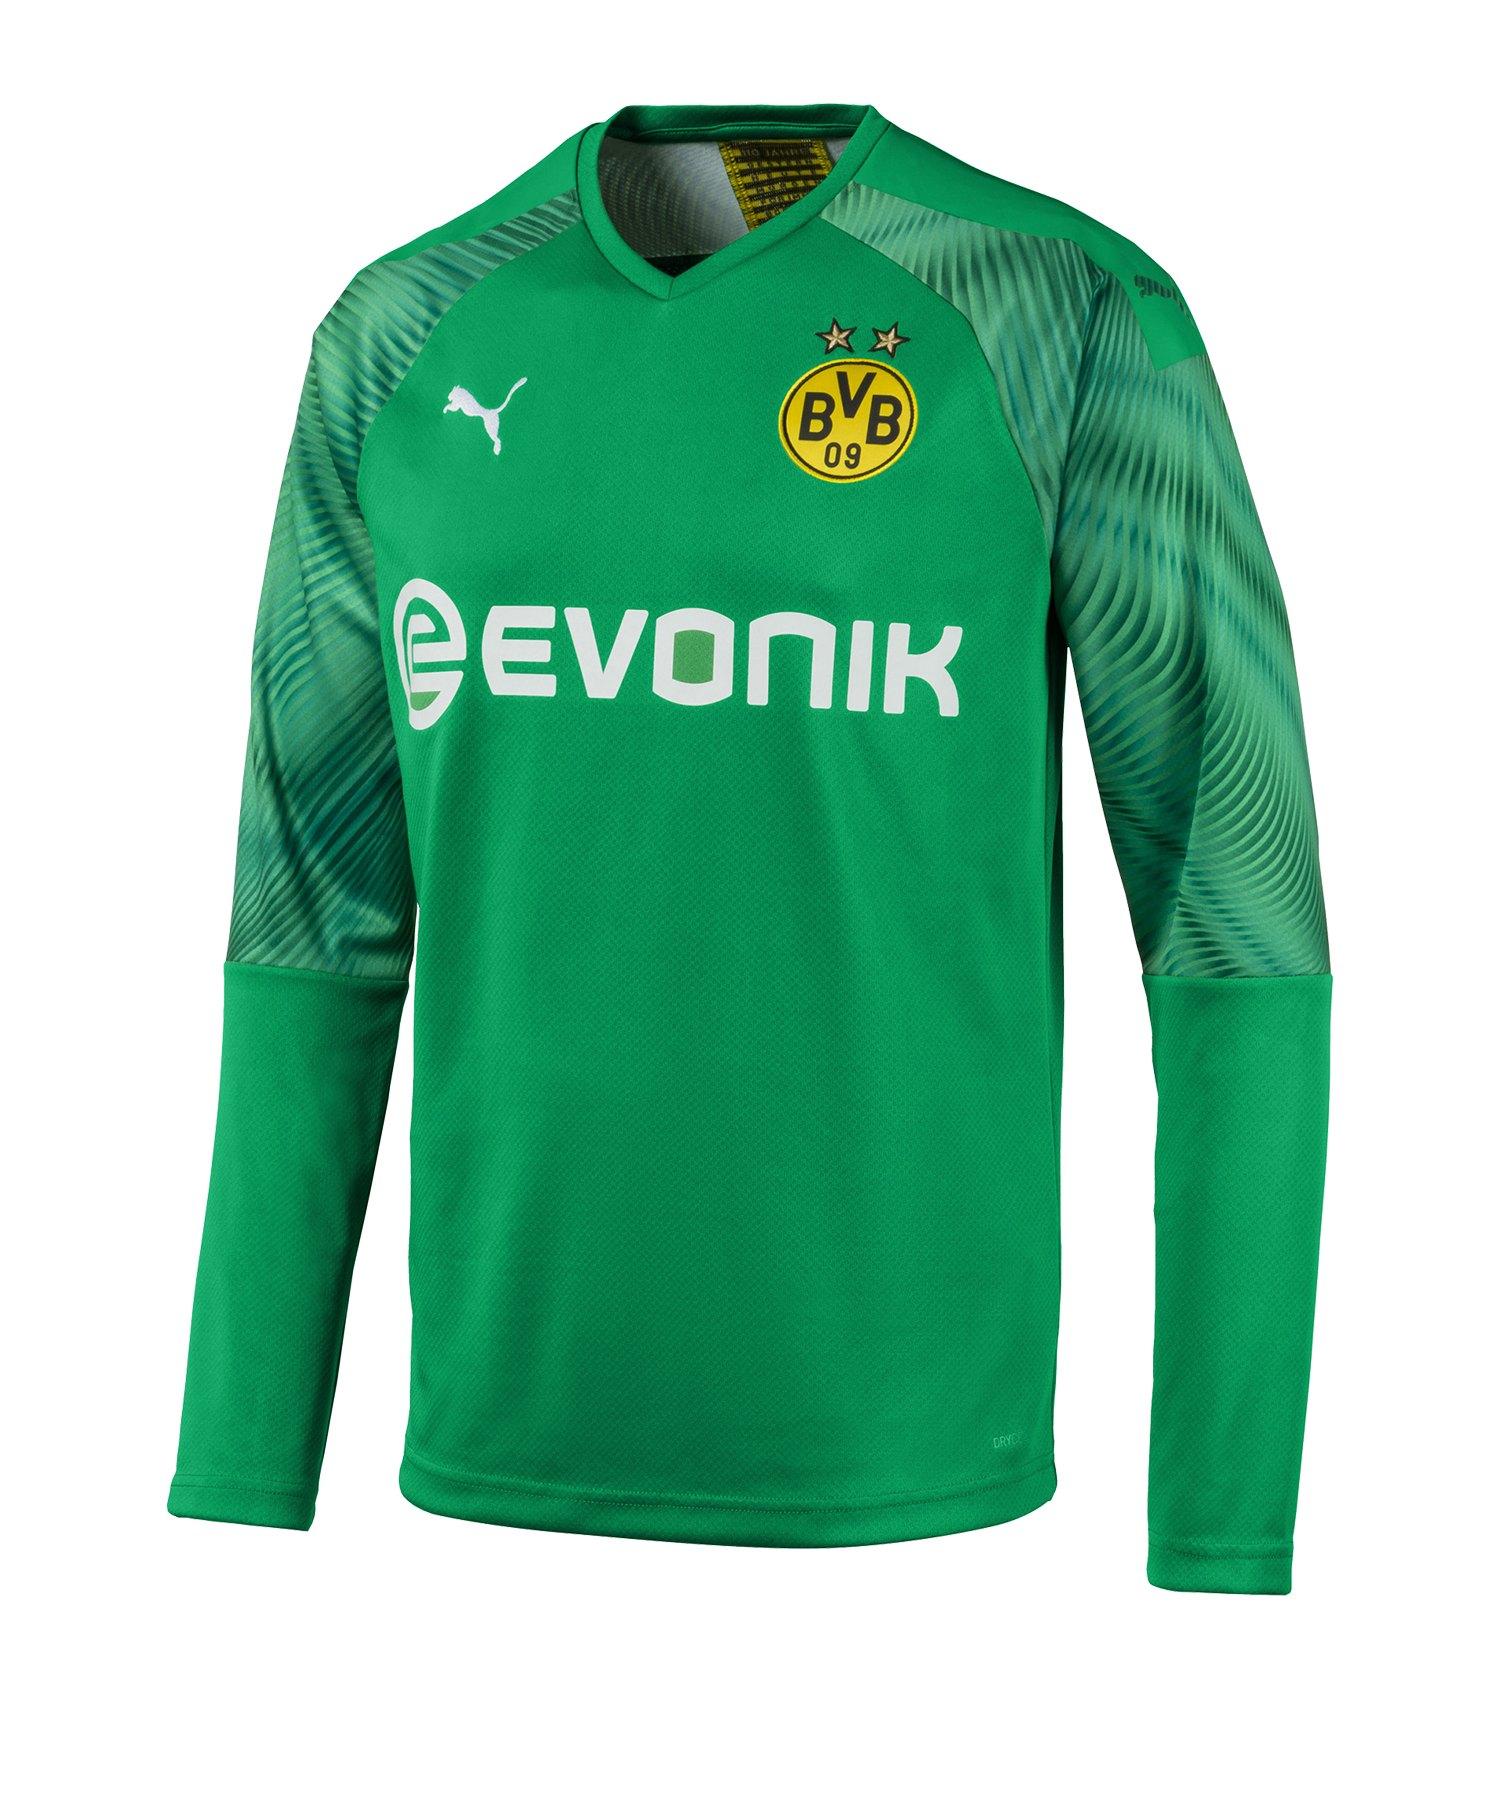 PUMA BVB Dortmund Torwarttrikot 2019/2020 Grün F03 - Gruen